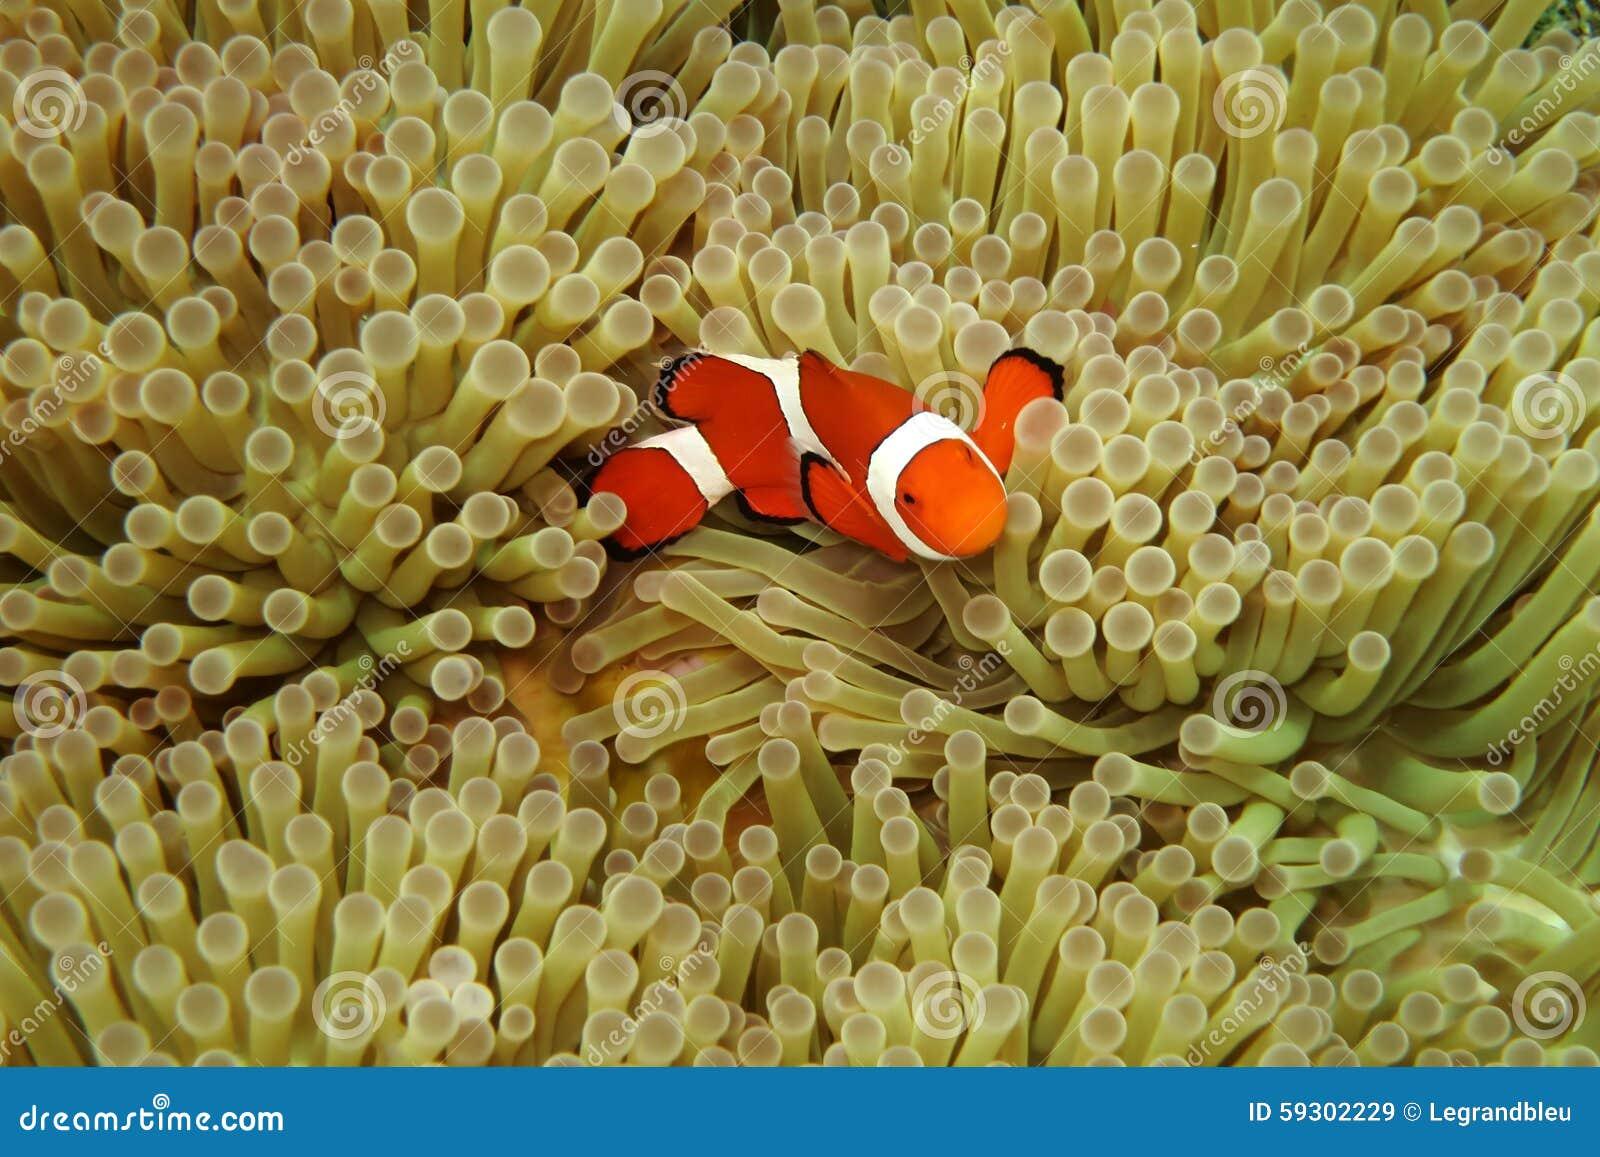 Nemo dans des actinies